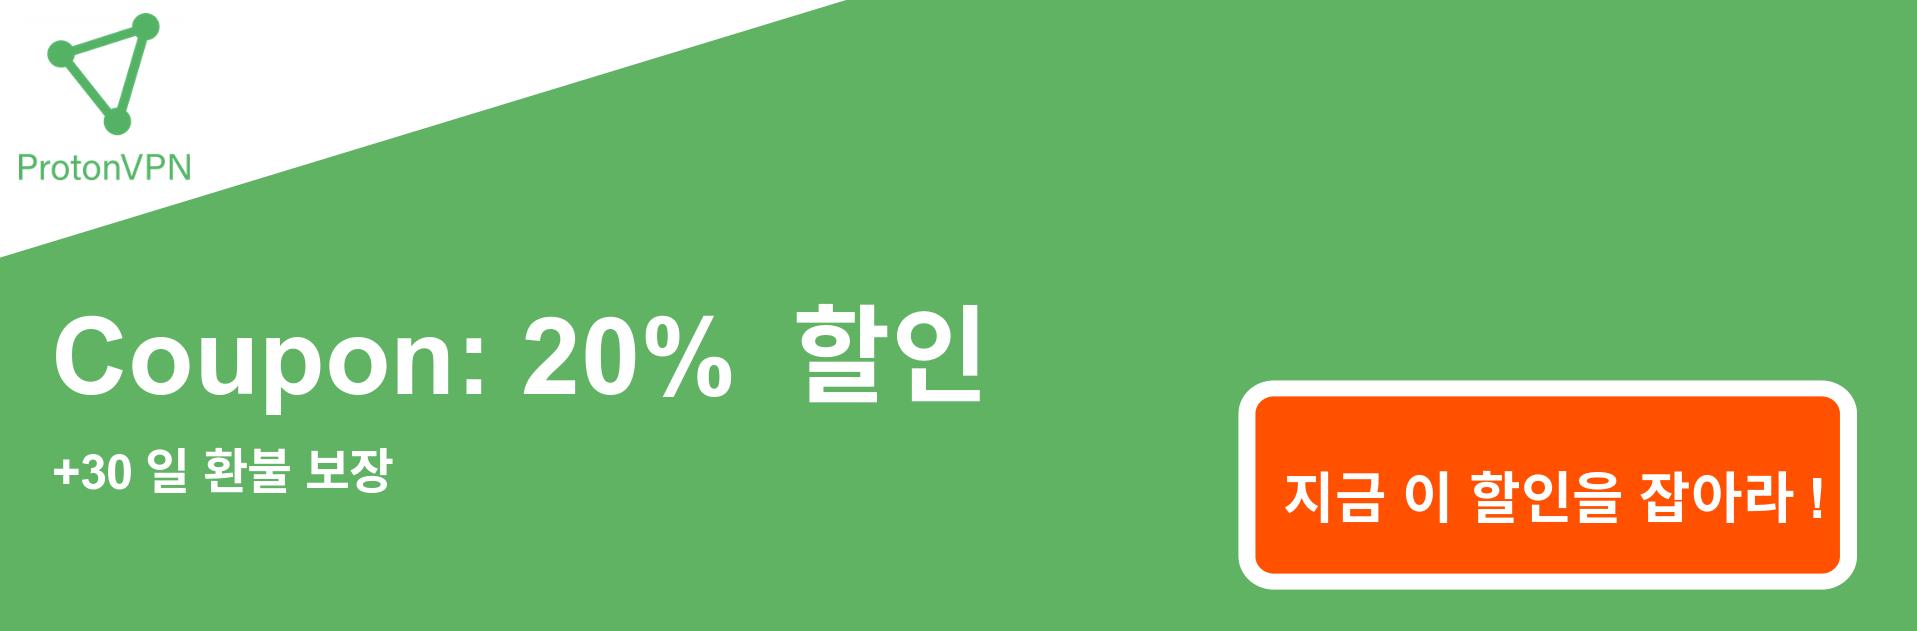 ProtonVPN 쿠폰 배너-20 % 할인